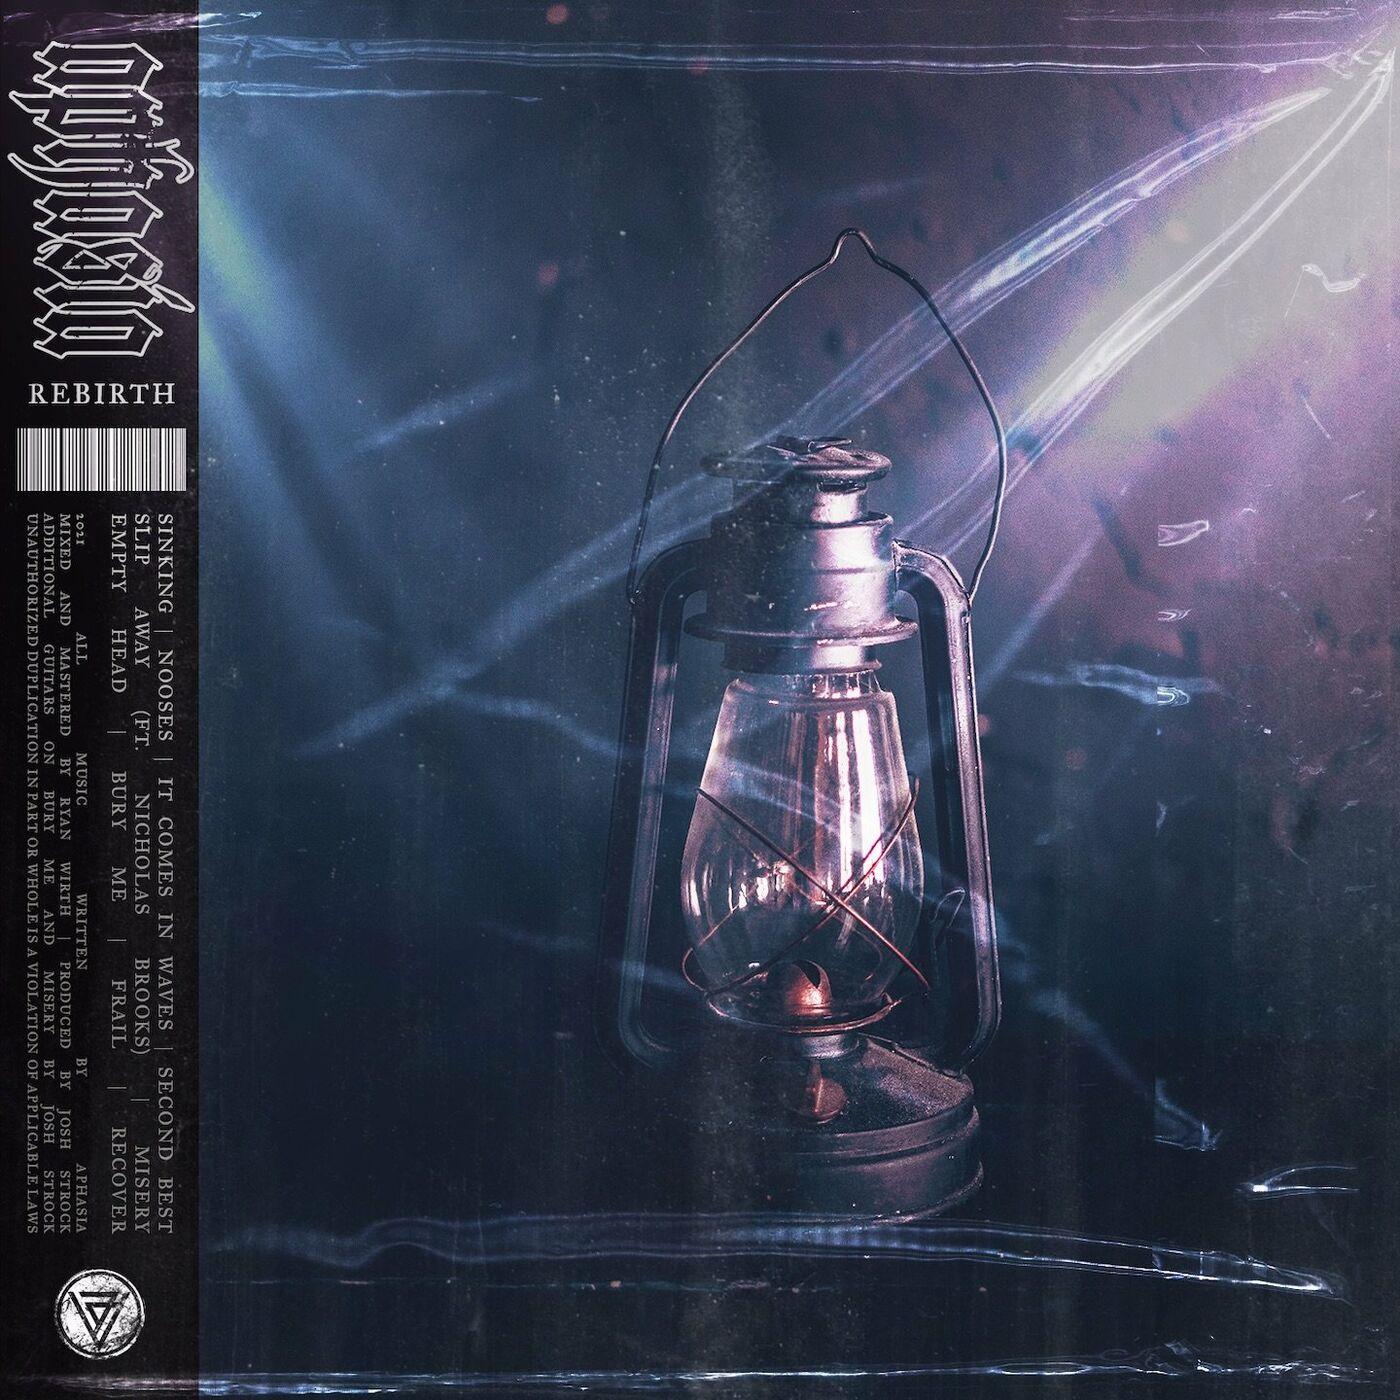 Aphasia - Sinking [single] (2021)